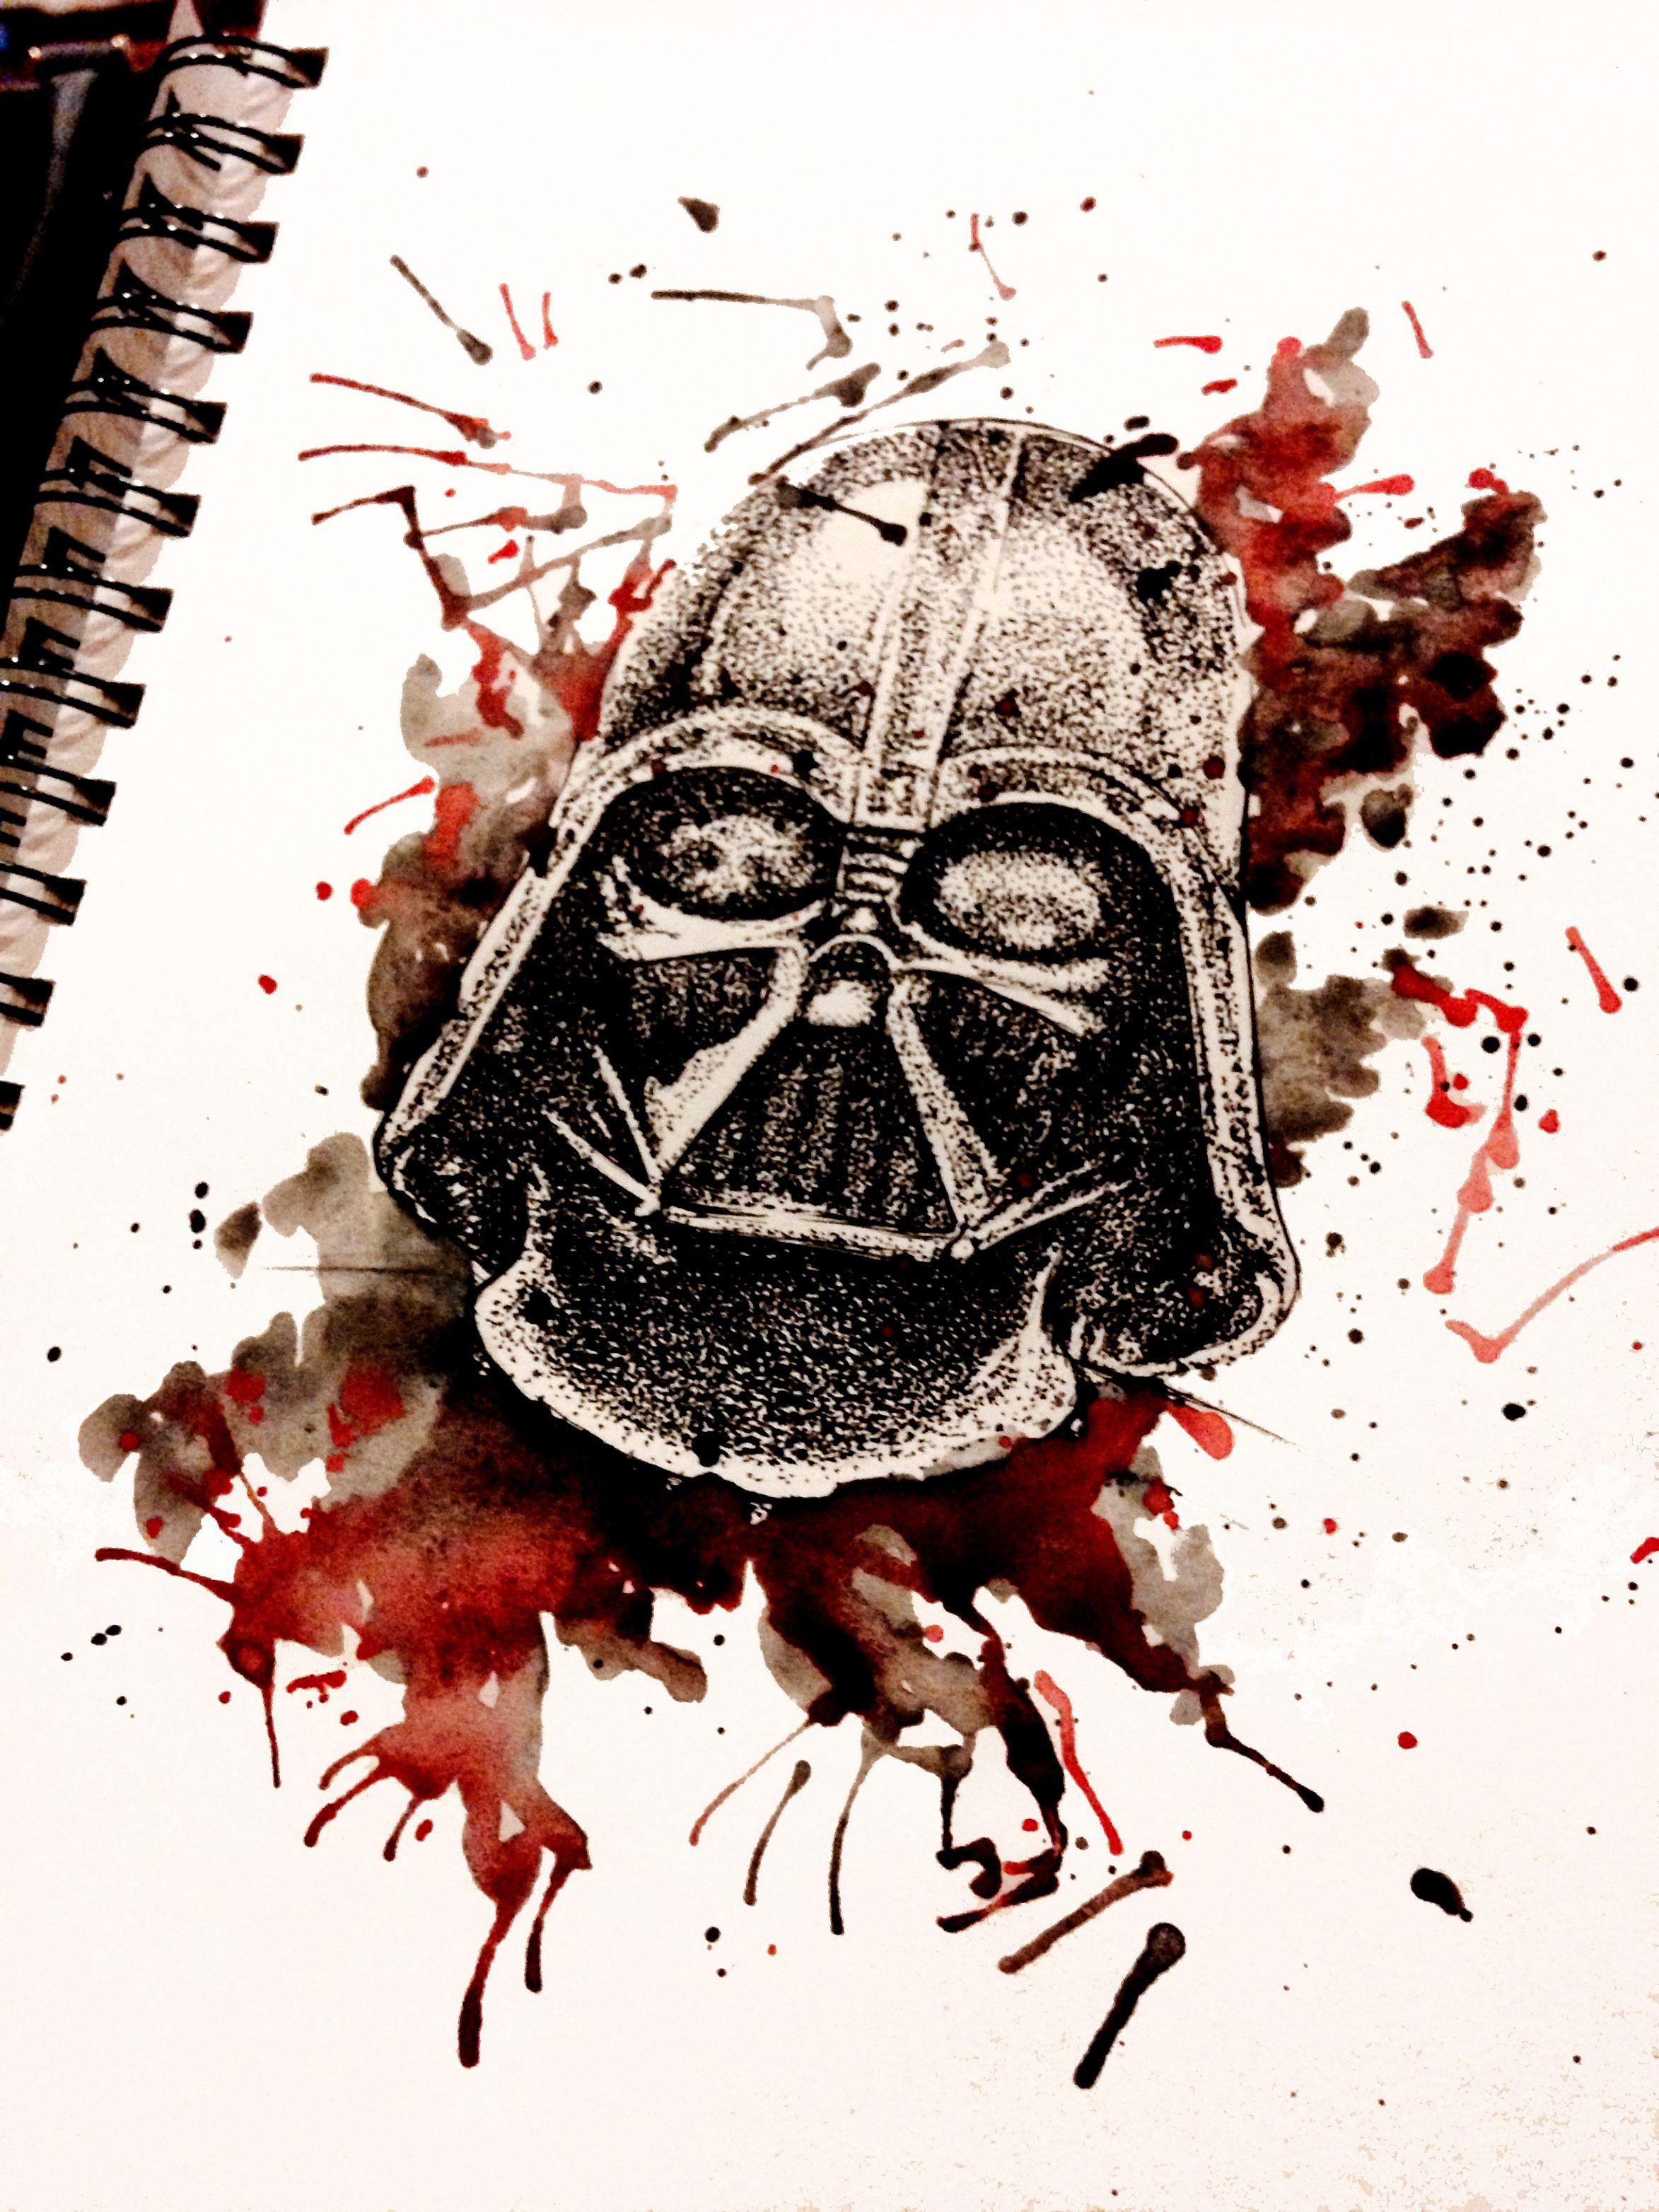 2346x3128 Darth Vader Watercolor Star Wars Darth Vader, Star